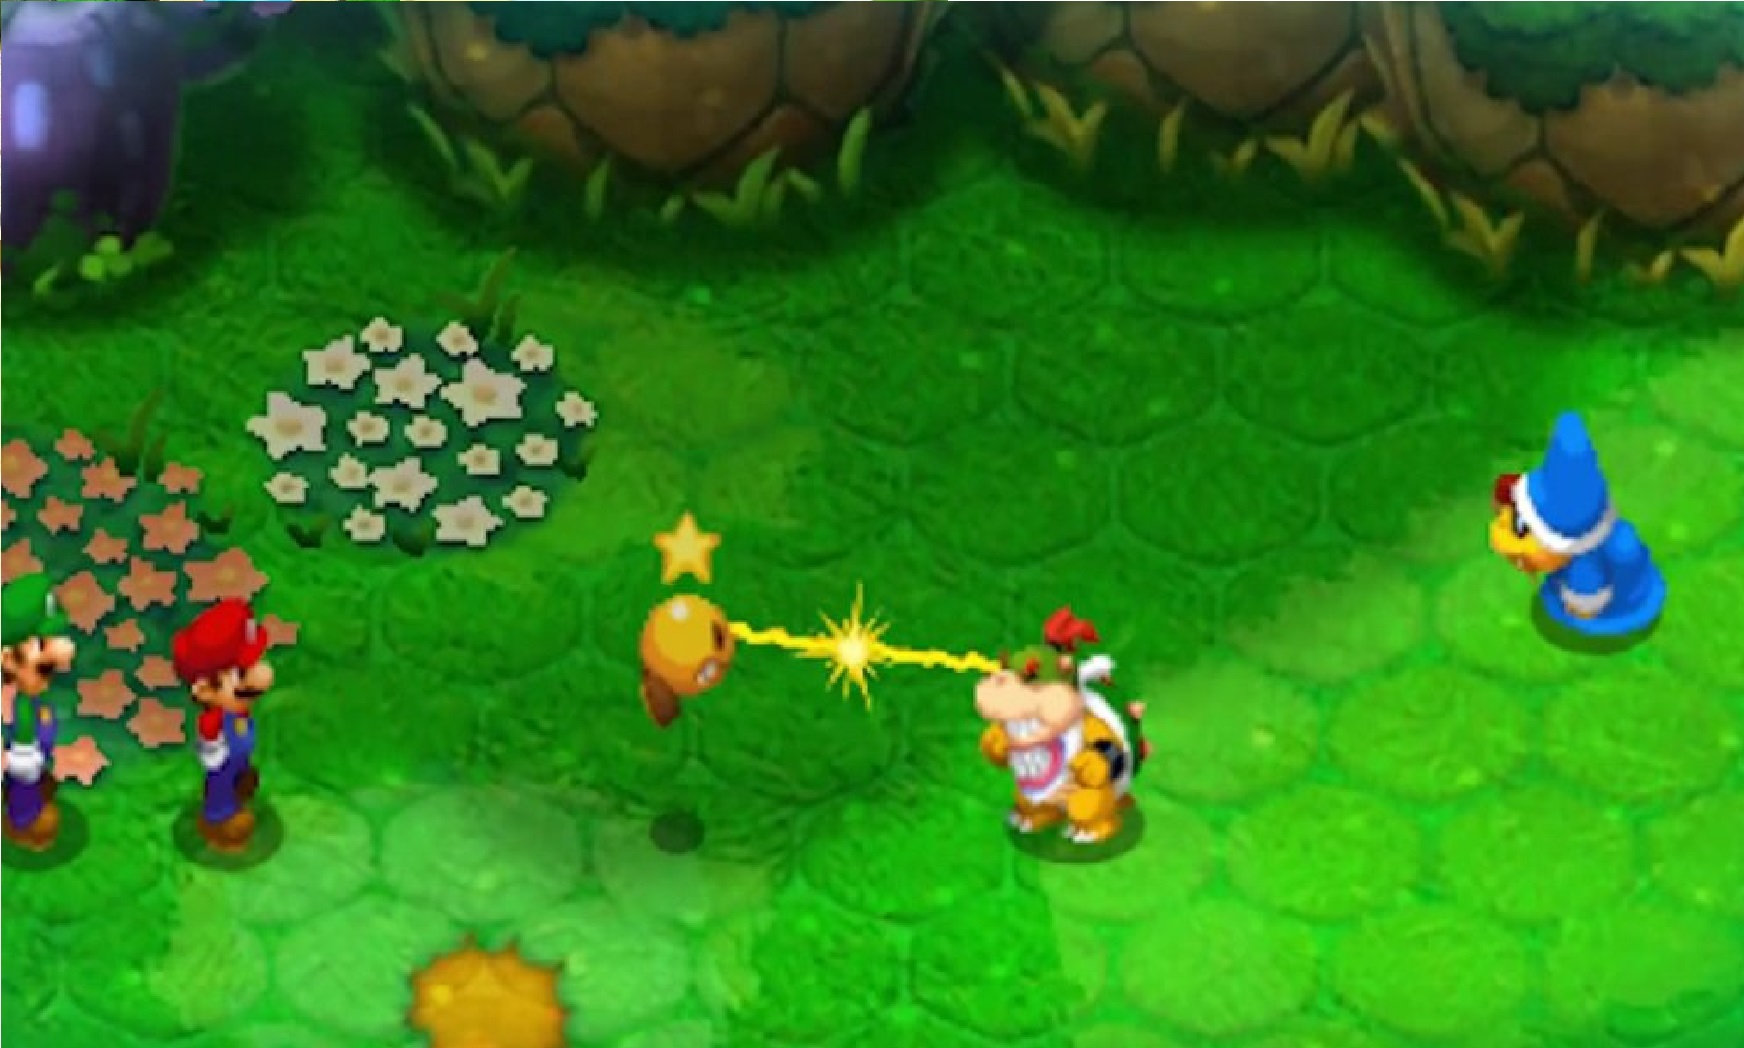 Mario & Luigi Bowser's Inside Job